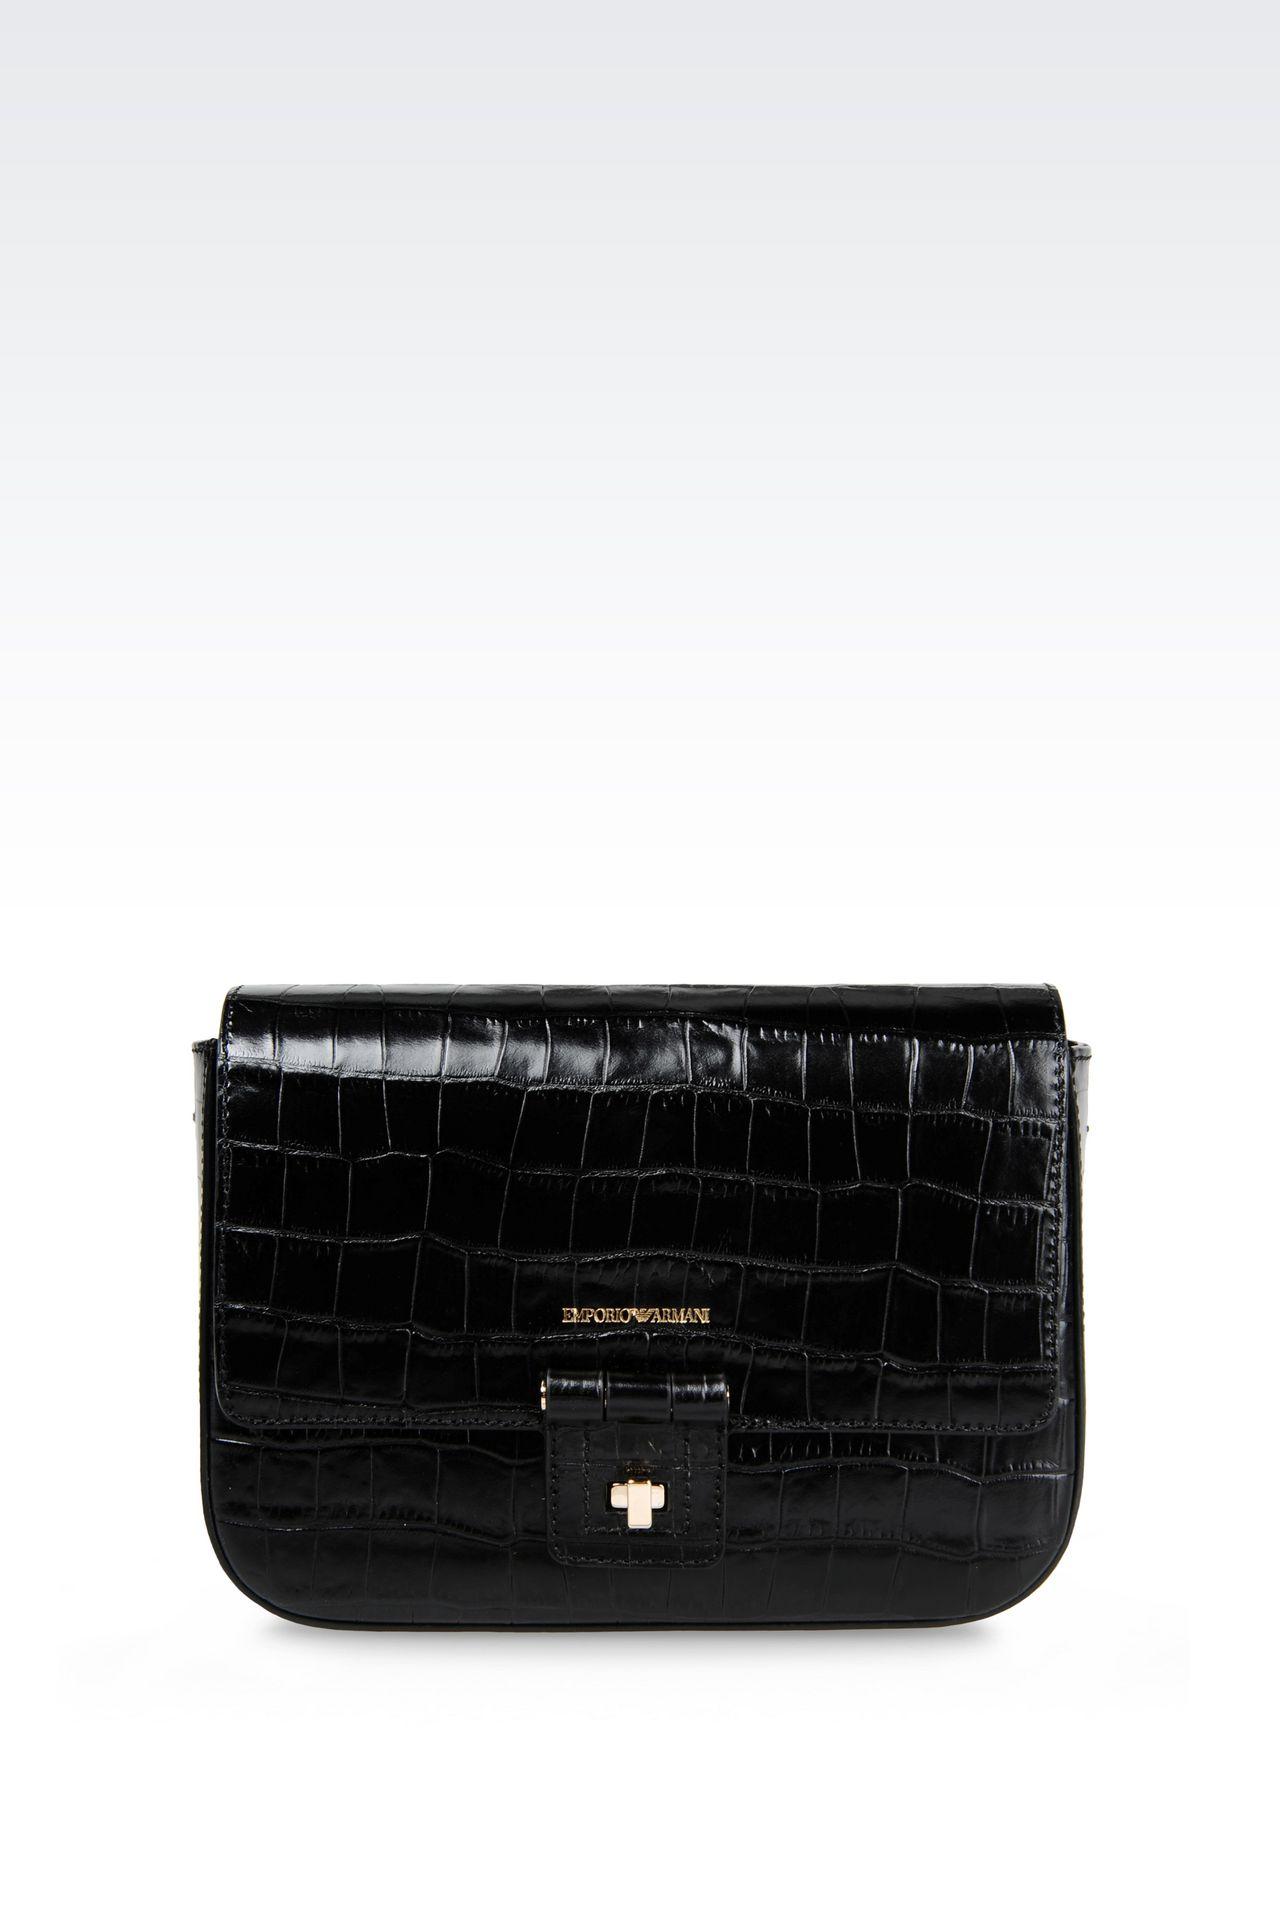 SHOULDER BAG IN CROC PRINT CALFSKIN: Messenger bags Women by Armani - 0